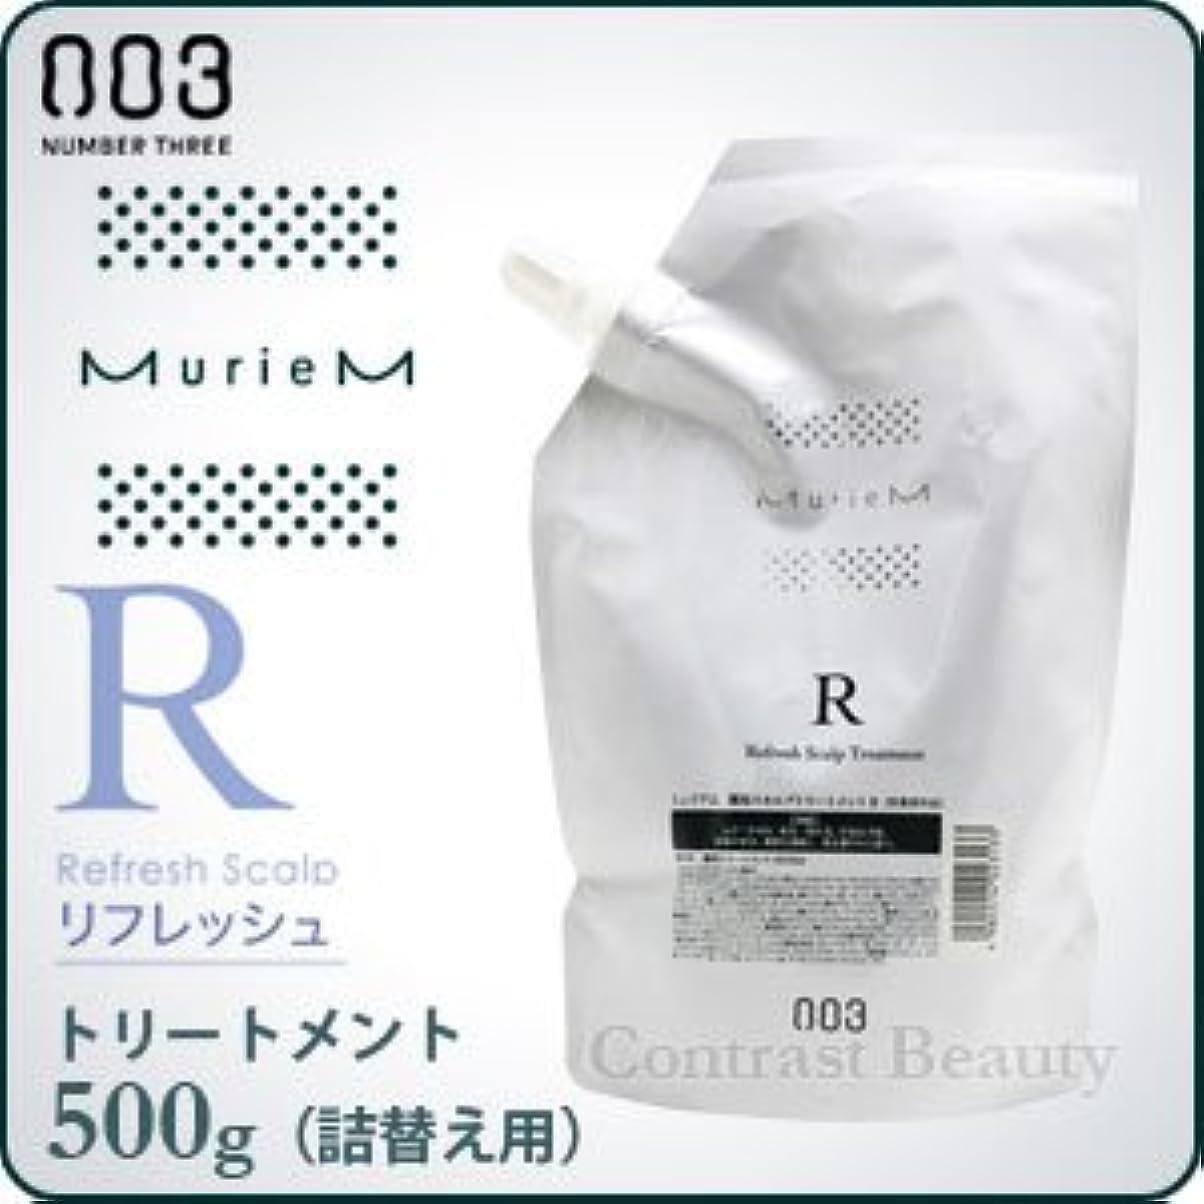 【X5個セット】 ナンバースリー ミュリアム クリスタル 薬用スカルプトリートメント R 500g 詰替え用 医薬部外品